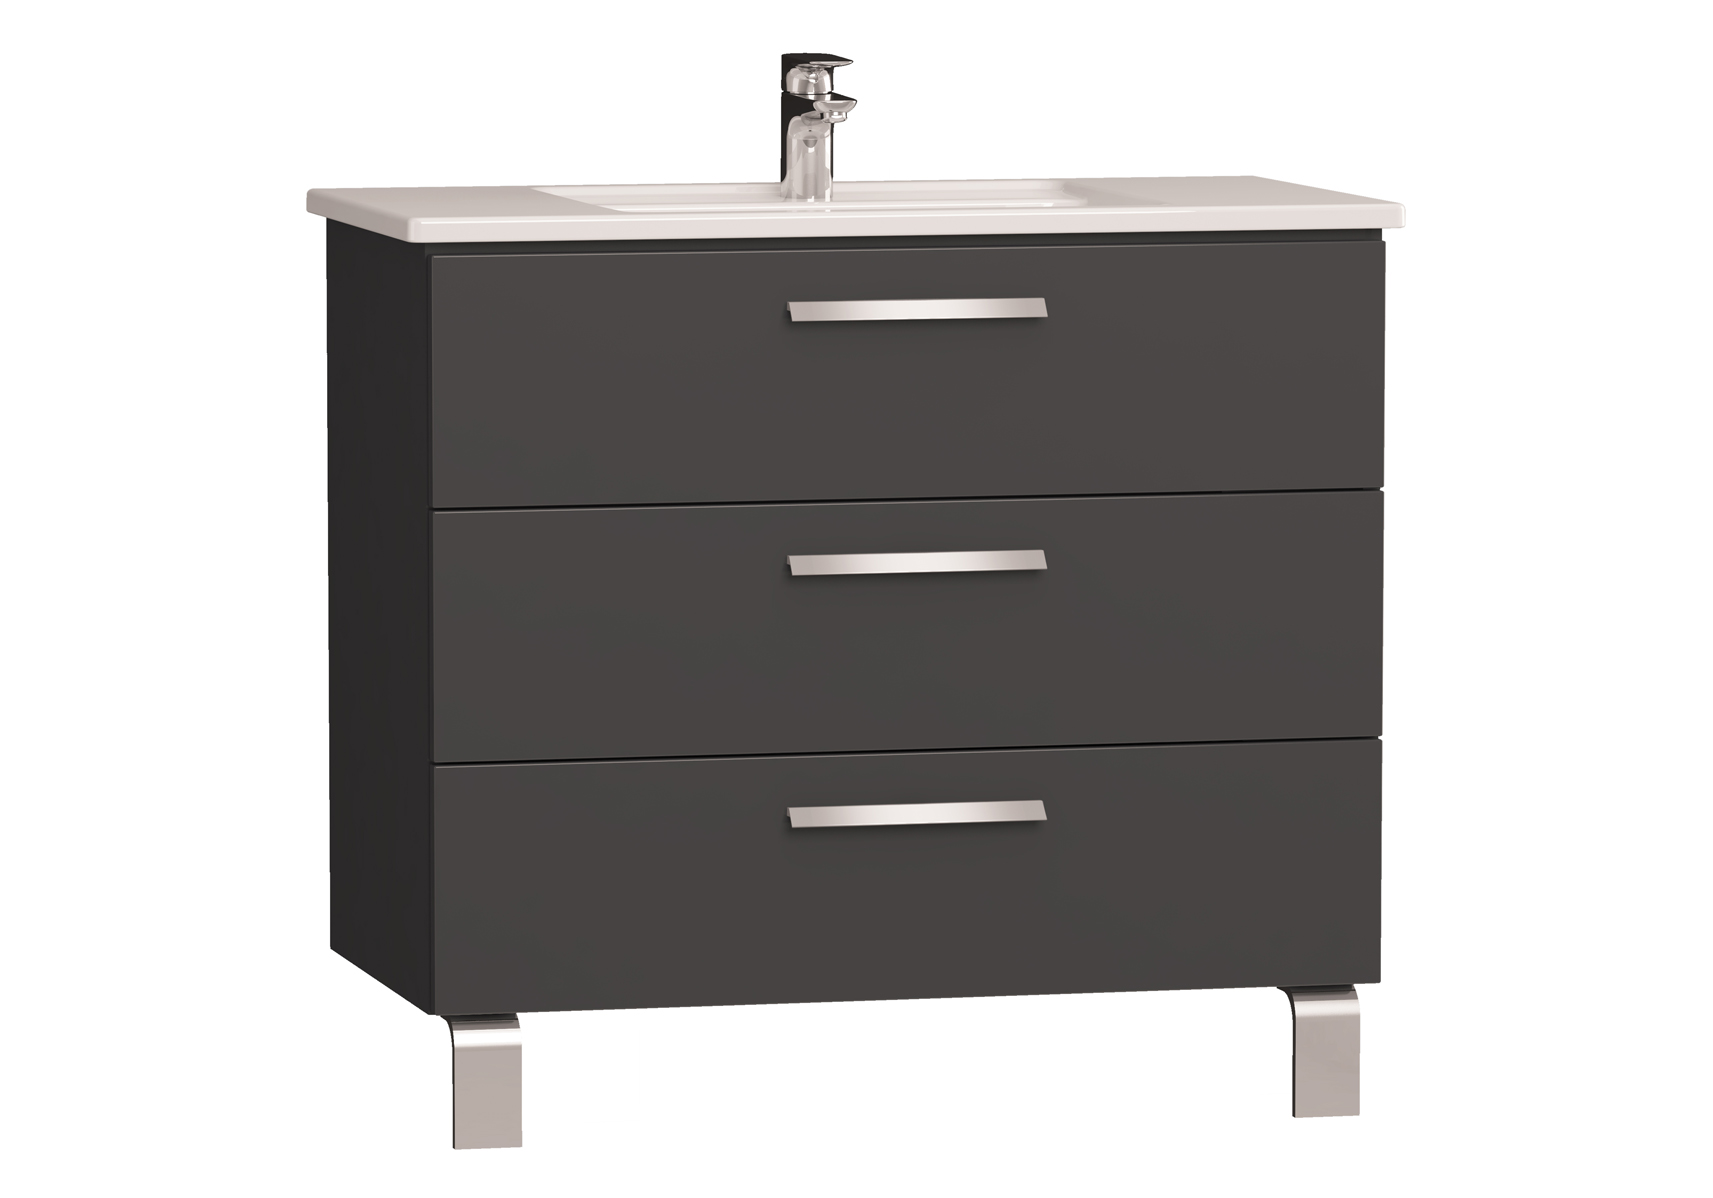 Integra meuble avec plan céramique avec trois tiroirs, 90 cm, anthraciteacite haute brillance